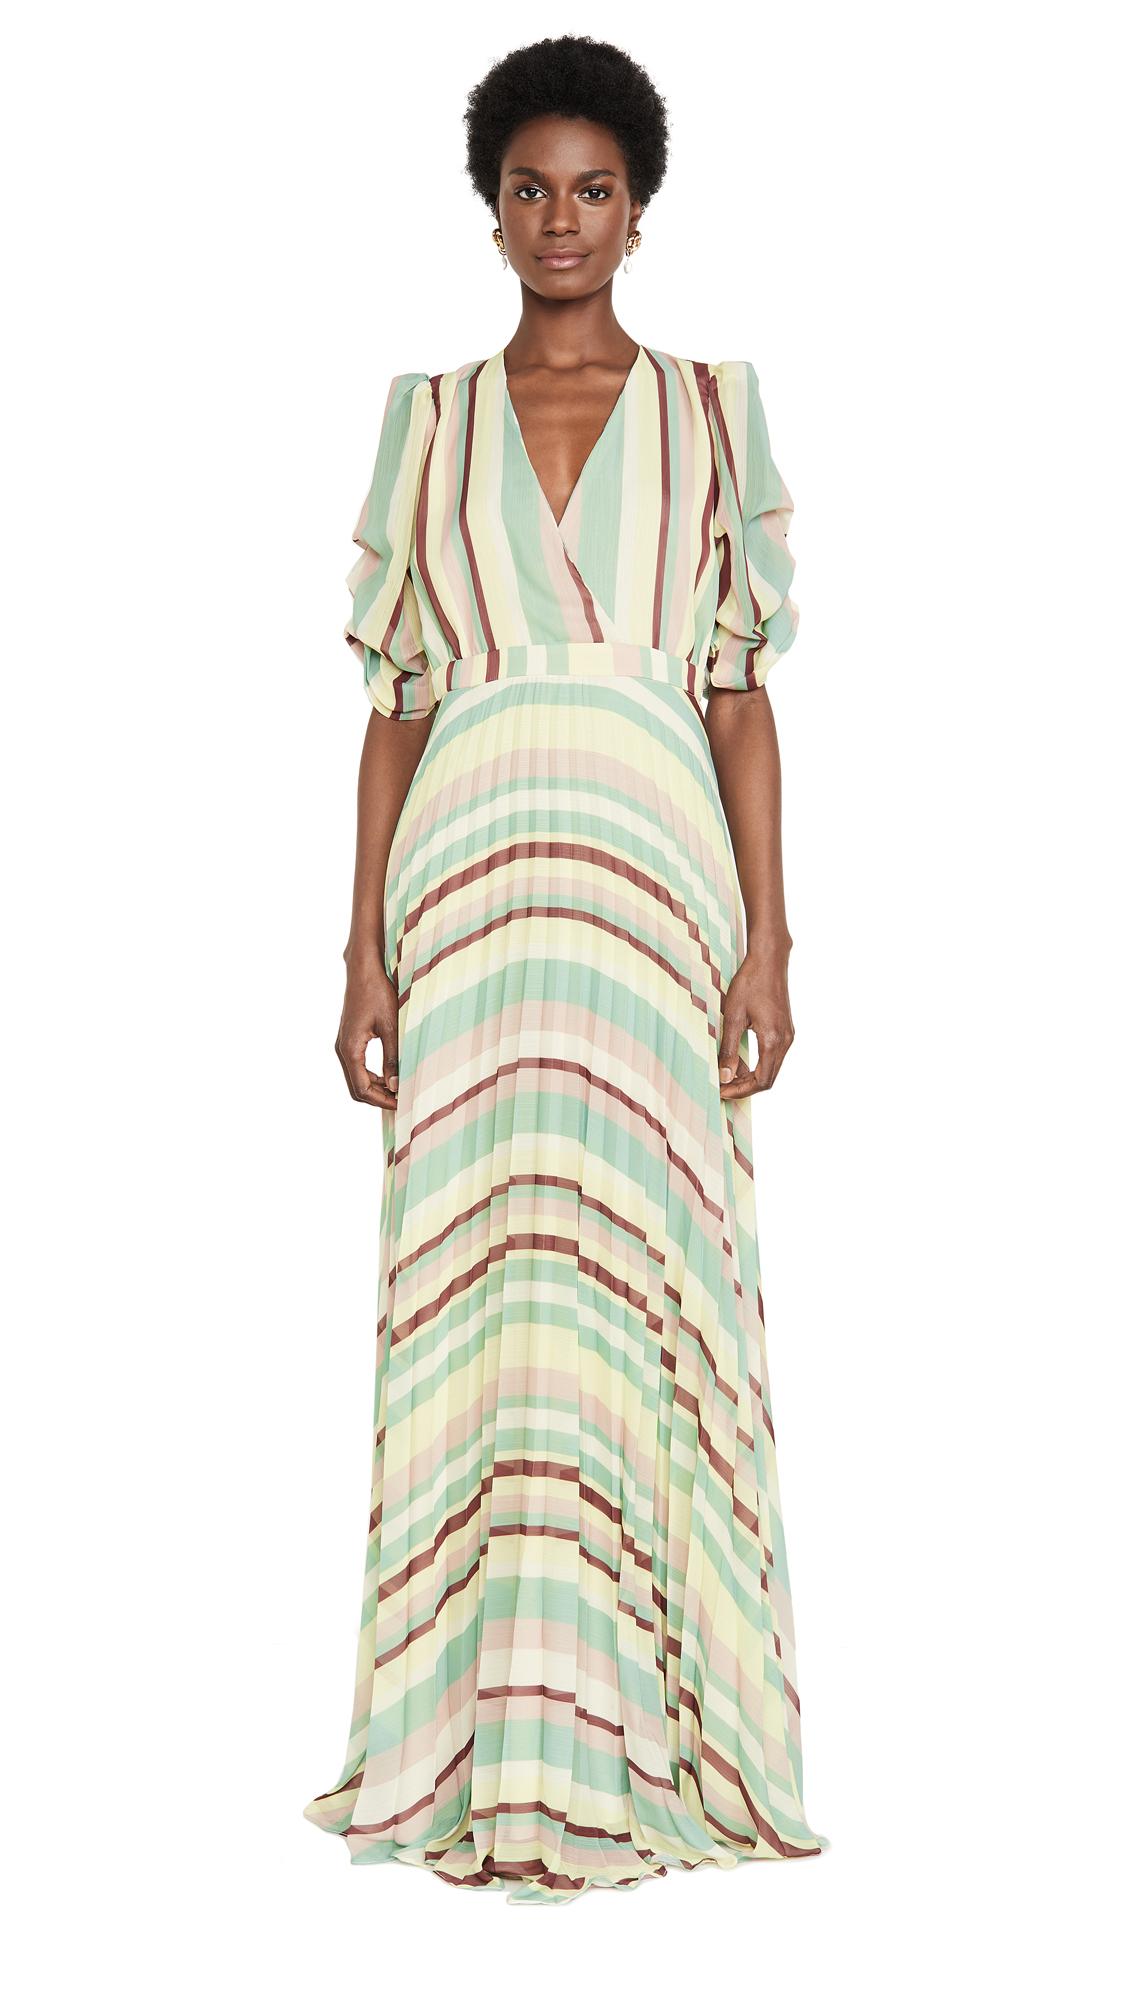 IORANE Striped Pleated Dress - 40% Off Sale